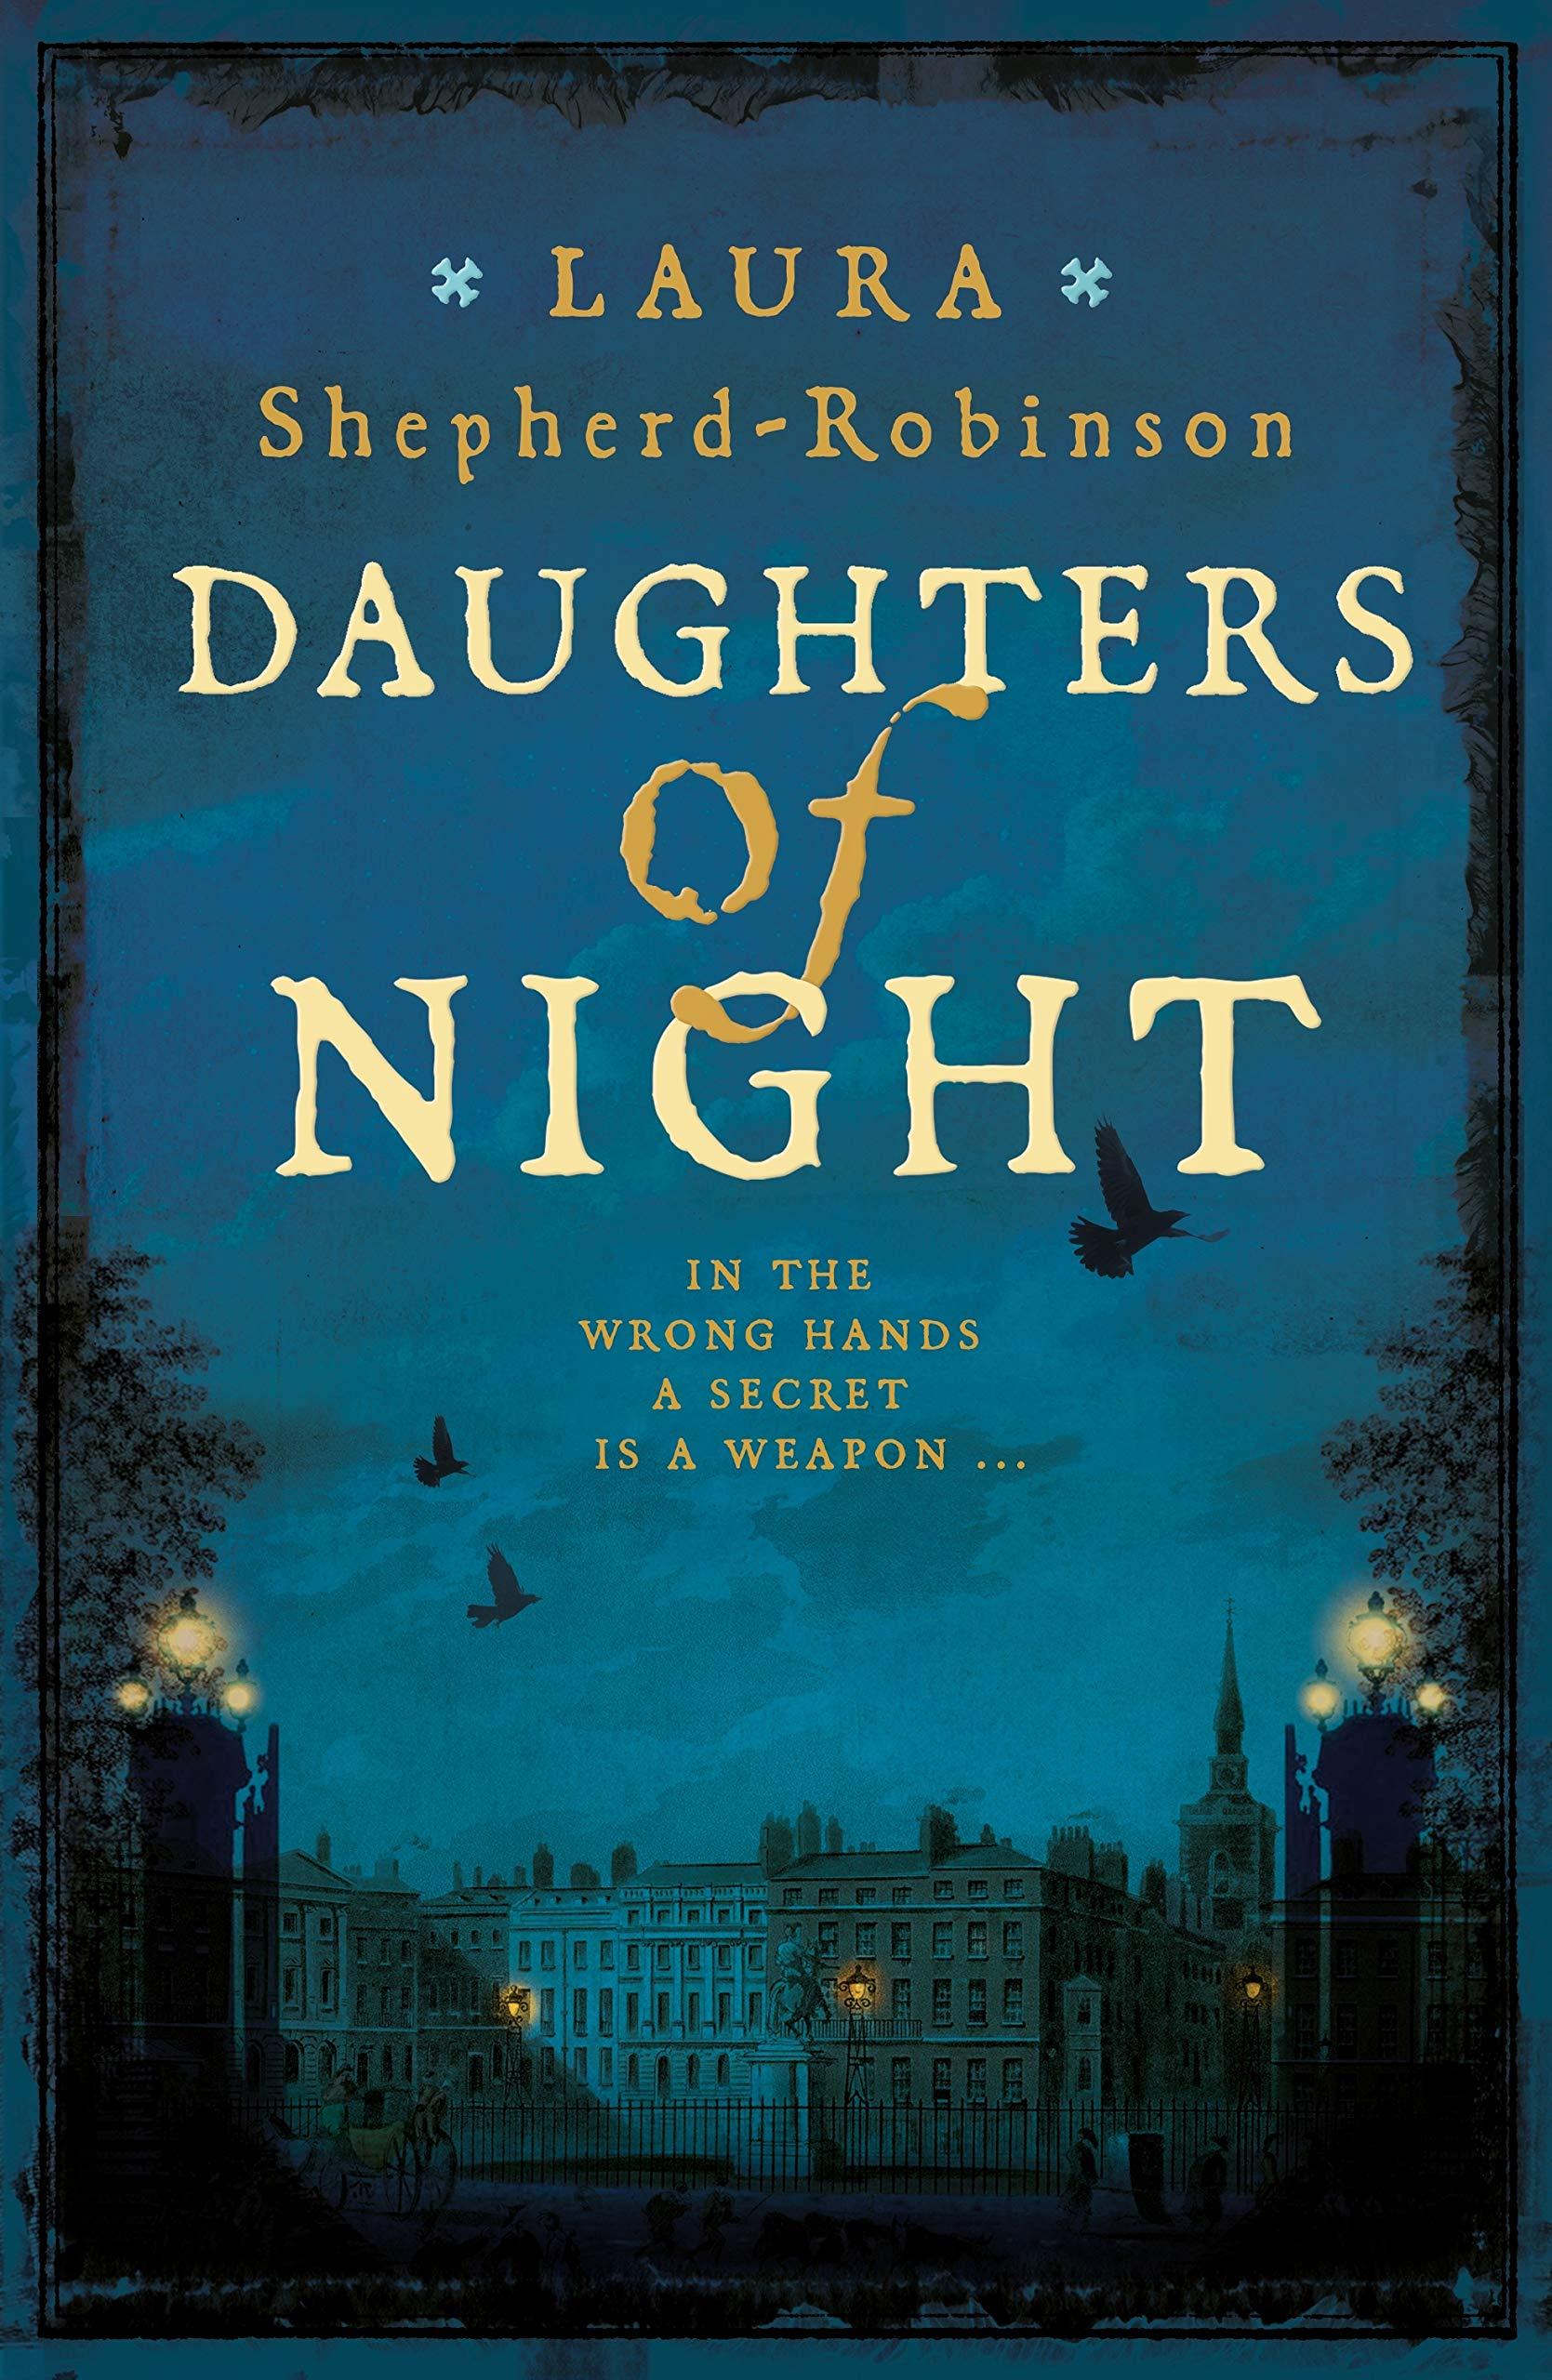 Daughters of Night: Amazon.co.uk: Shepherd-Robinson, Laura: 9781509880829:  Books